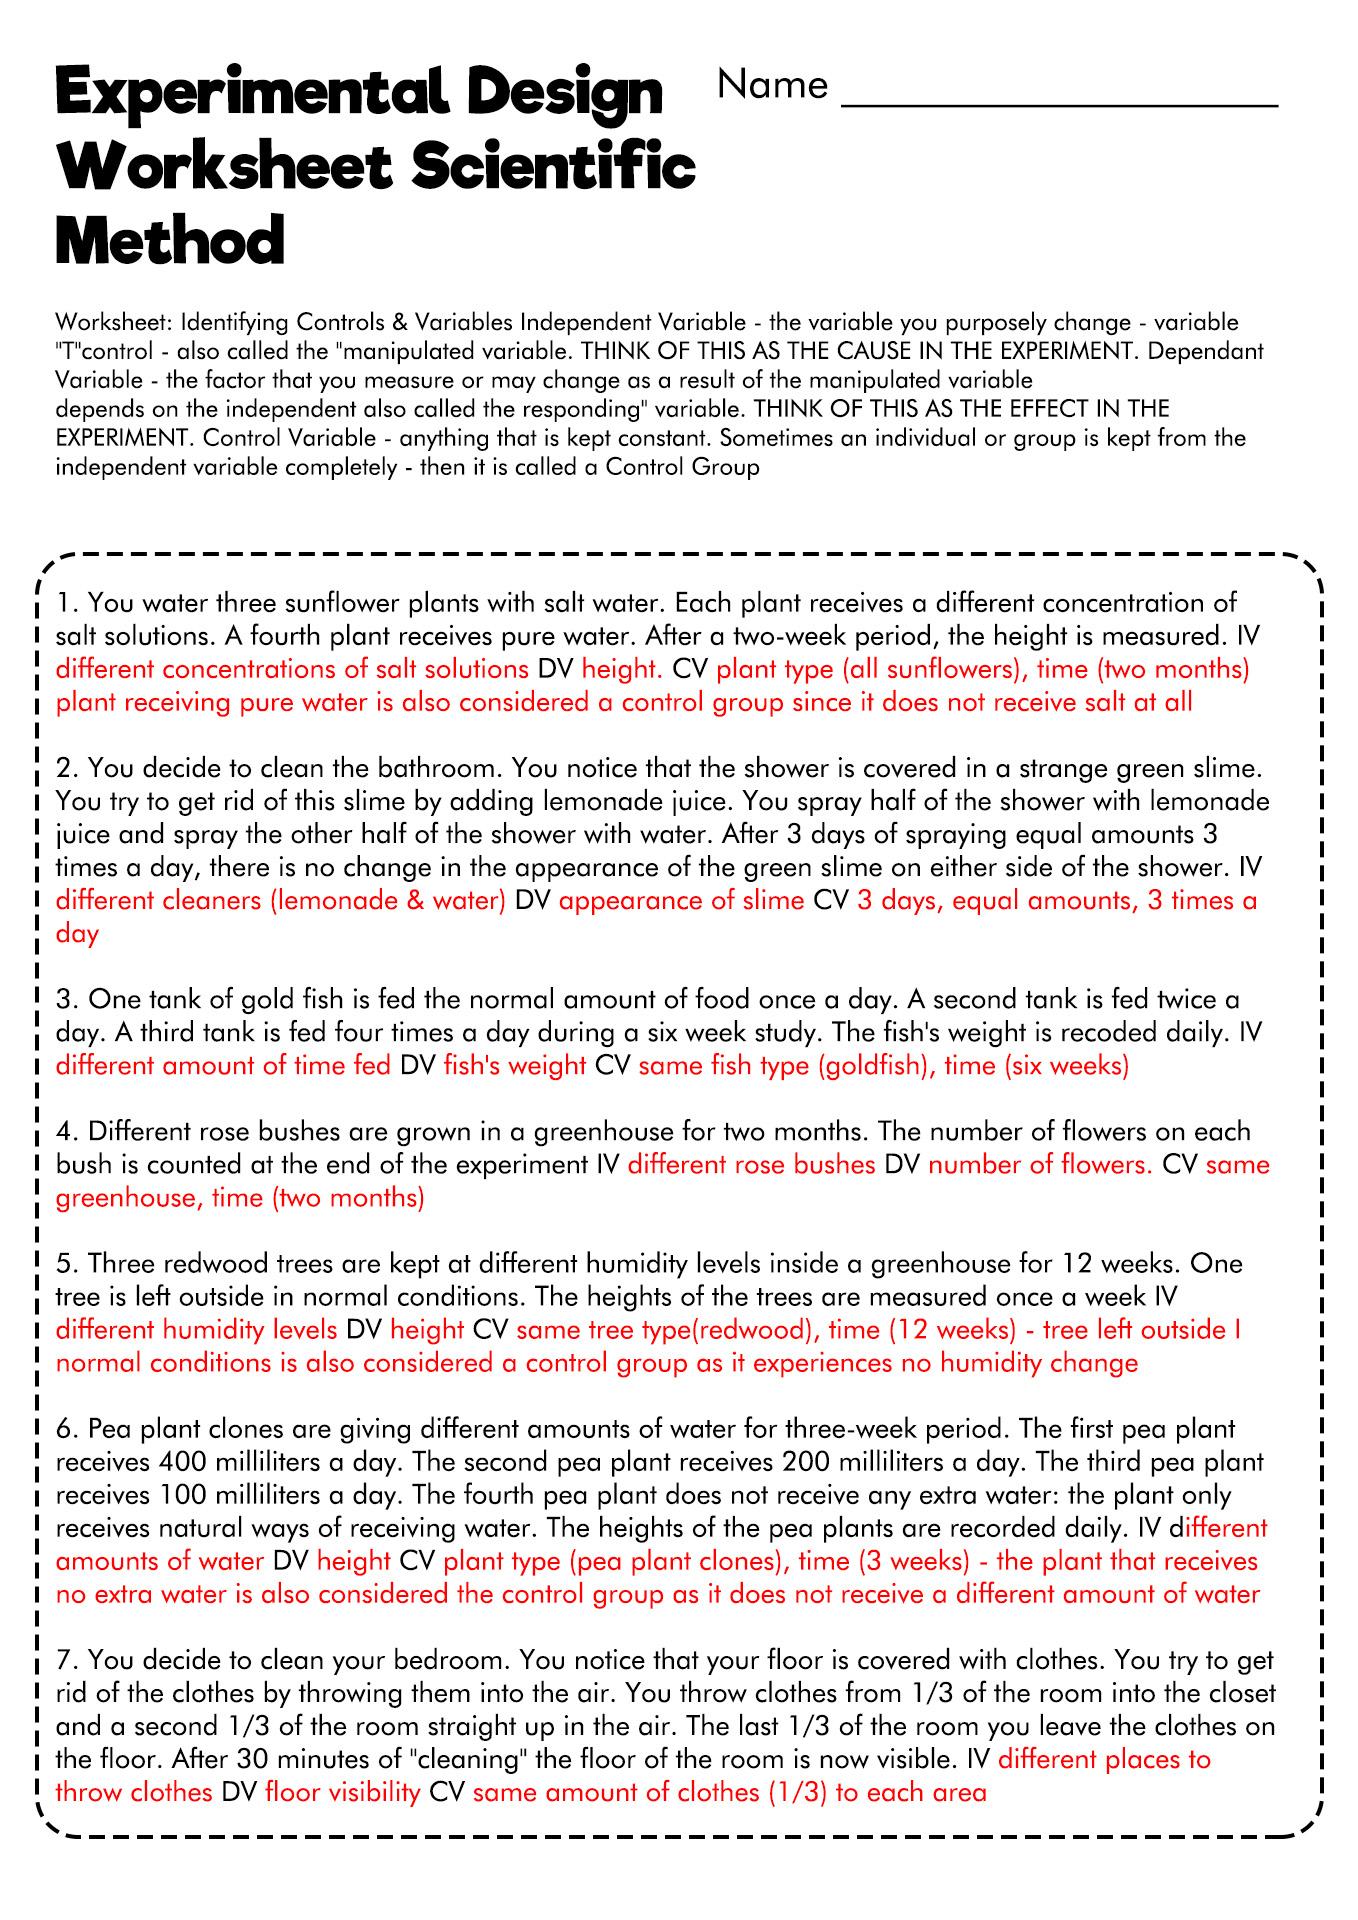 Determining Independent And Dependent Variables Worksheet